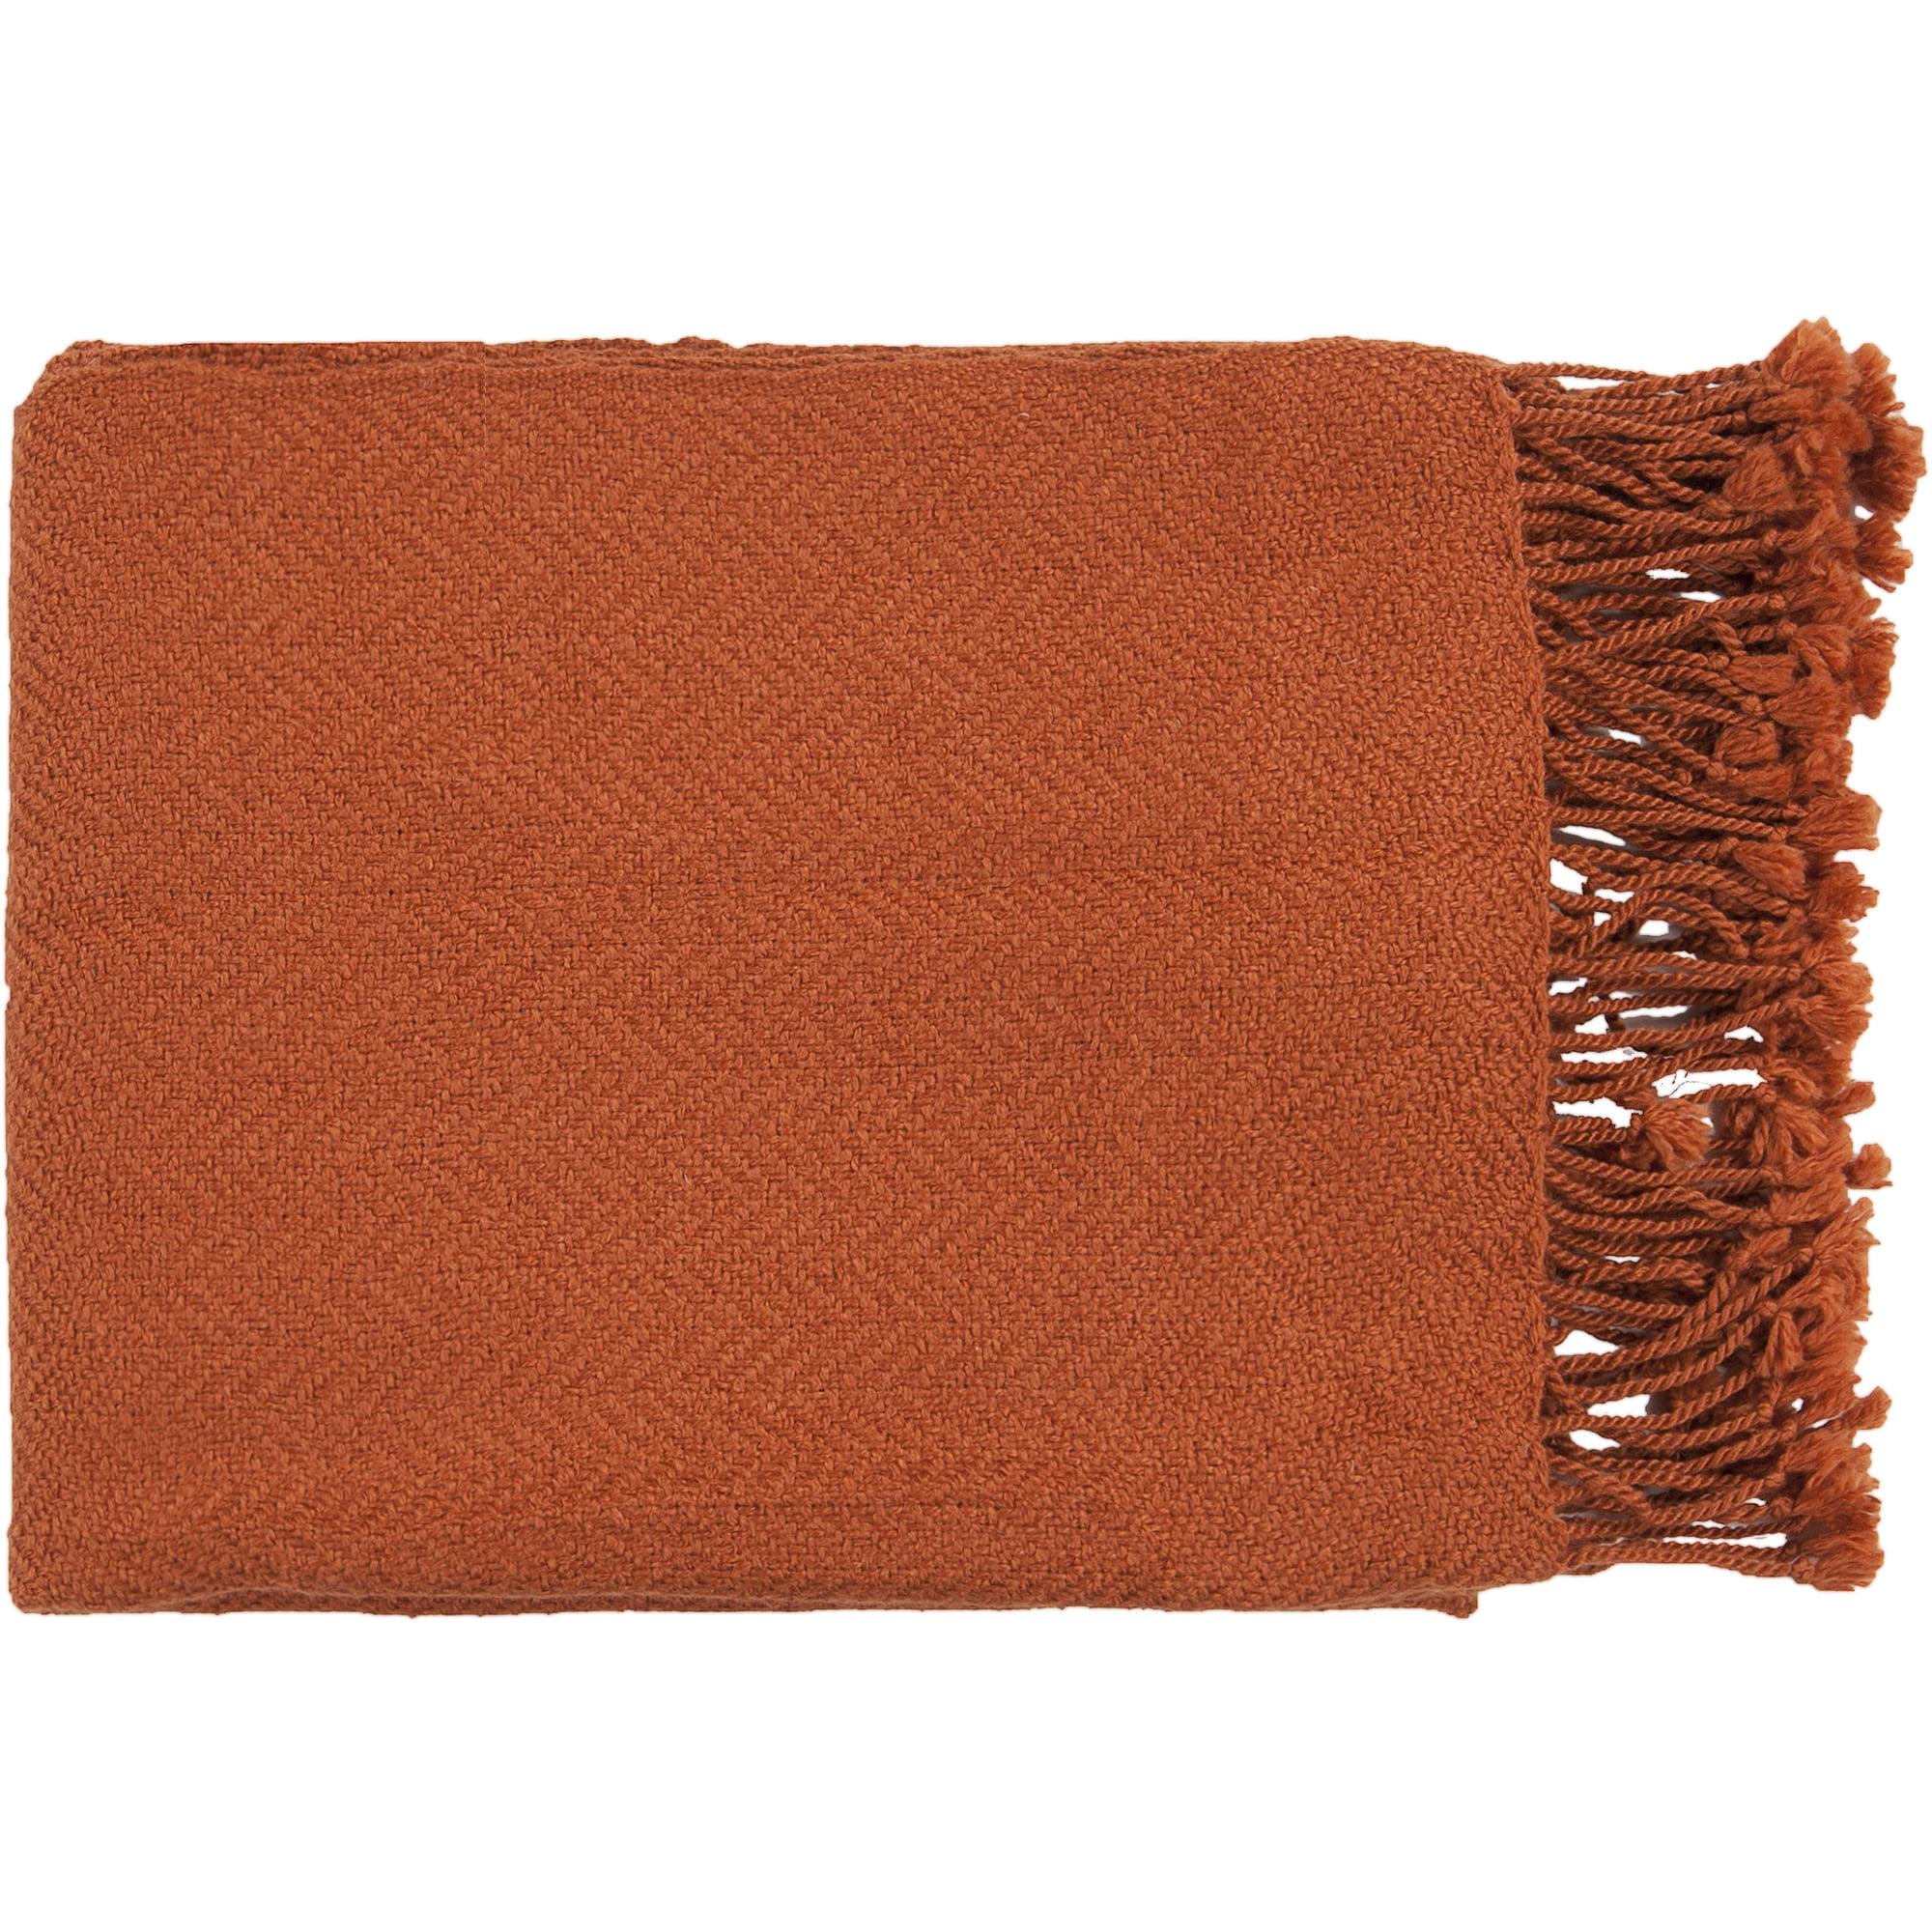 Libby Langdon Jamison Handmade Solid Herringbone Texture Decorative Throw, Rust